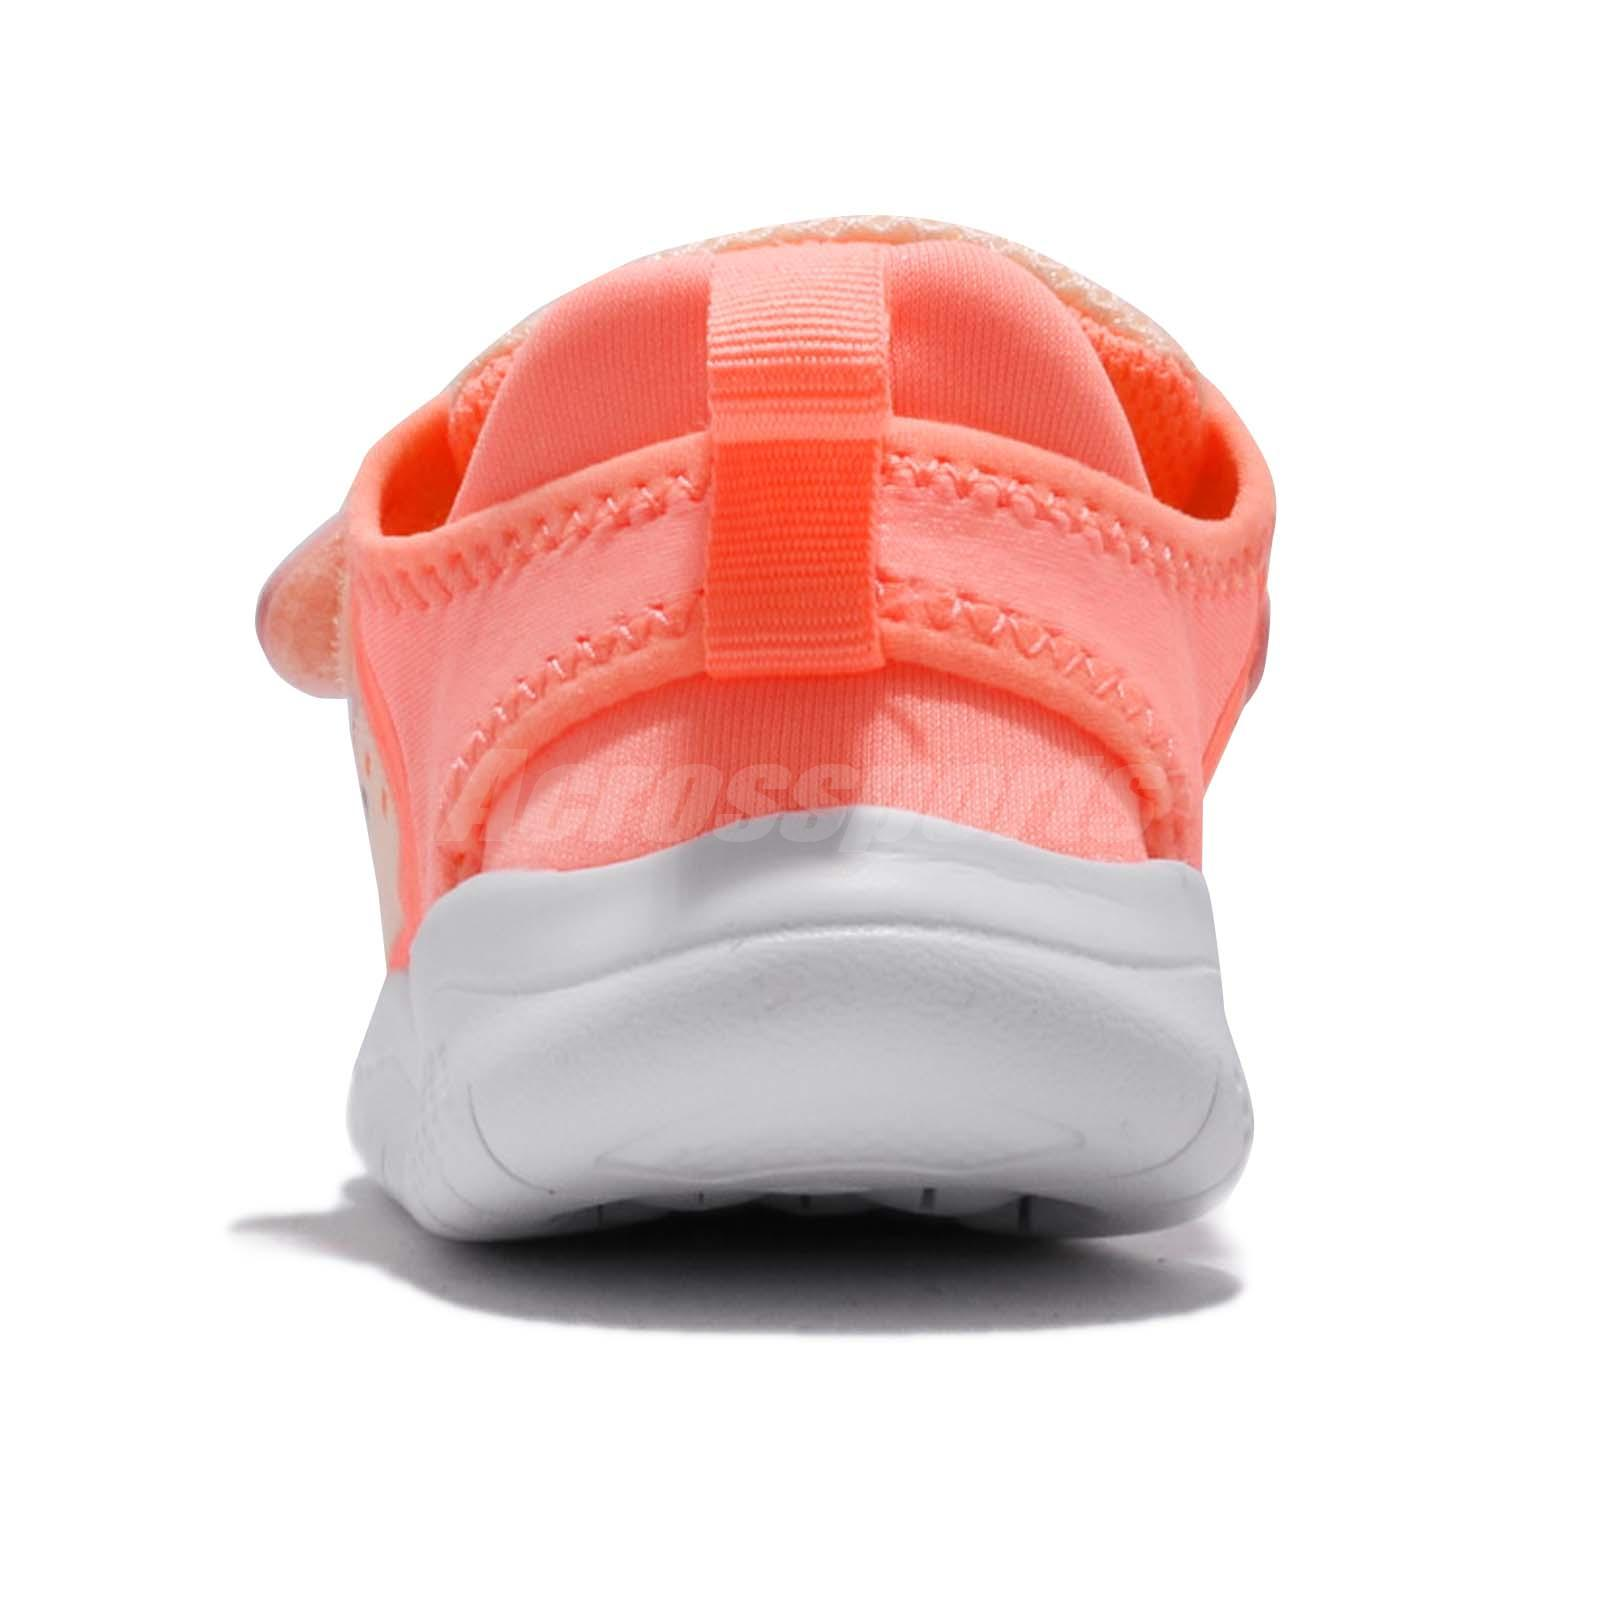 a9f378d33295 Nike Free RN 2018 TDV Crimson Tint Toddler Infant Baby Shoes ...